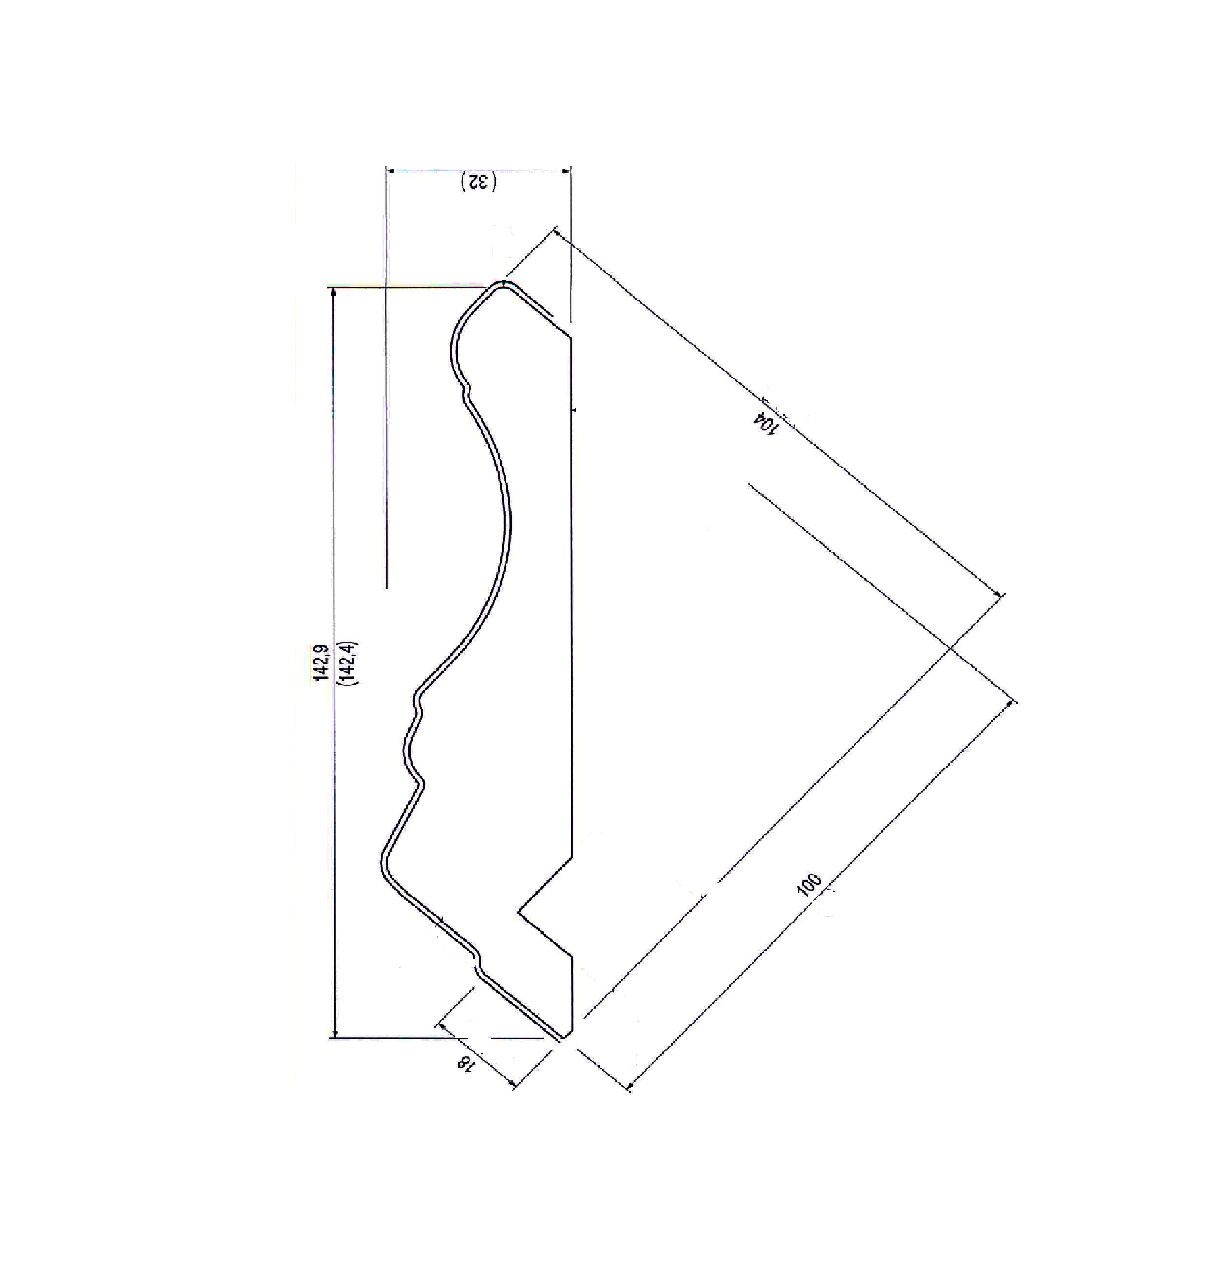 Карниз Леонардо верхний, прямой. МДФ в шпоне. id=15139